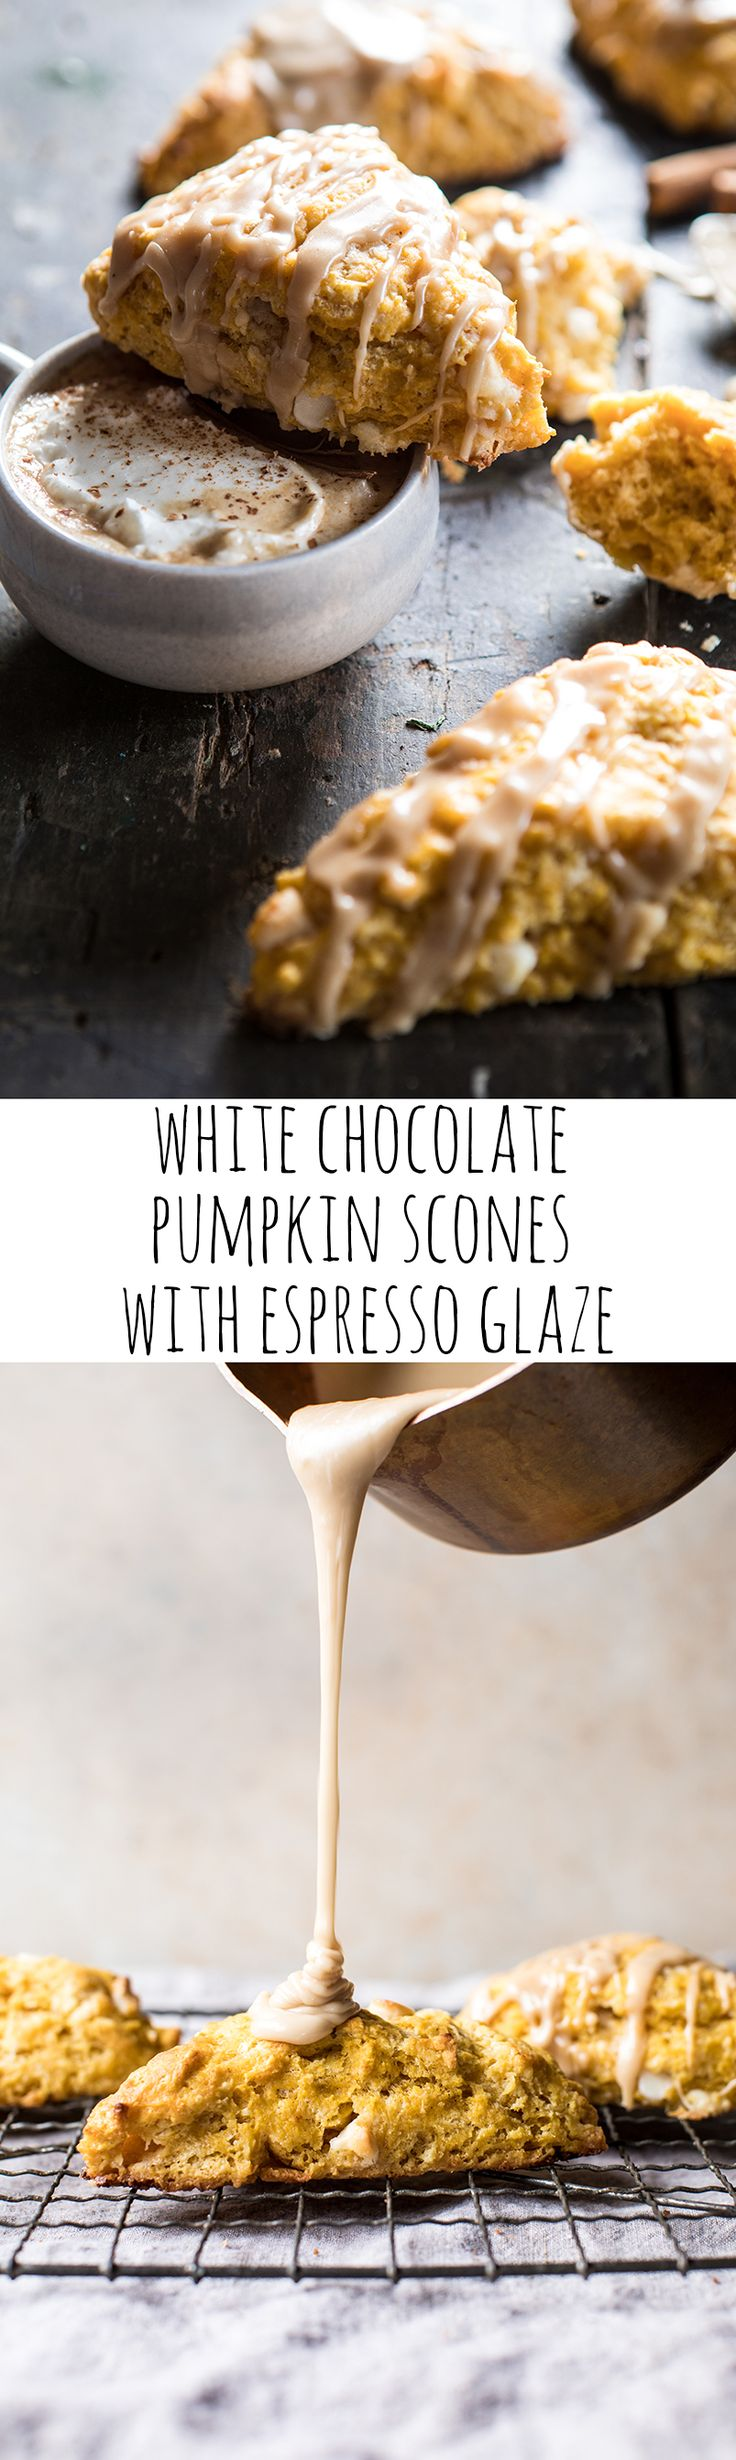 White Chocolate Pumpkin Scones with Espresso Glaze | halfbakedharvest.com @hbharvest